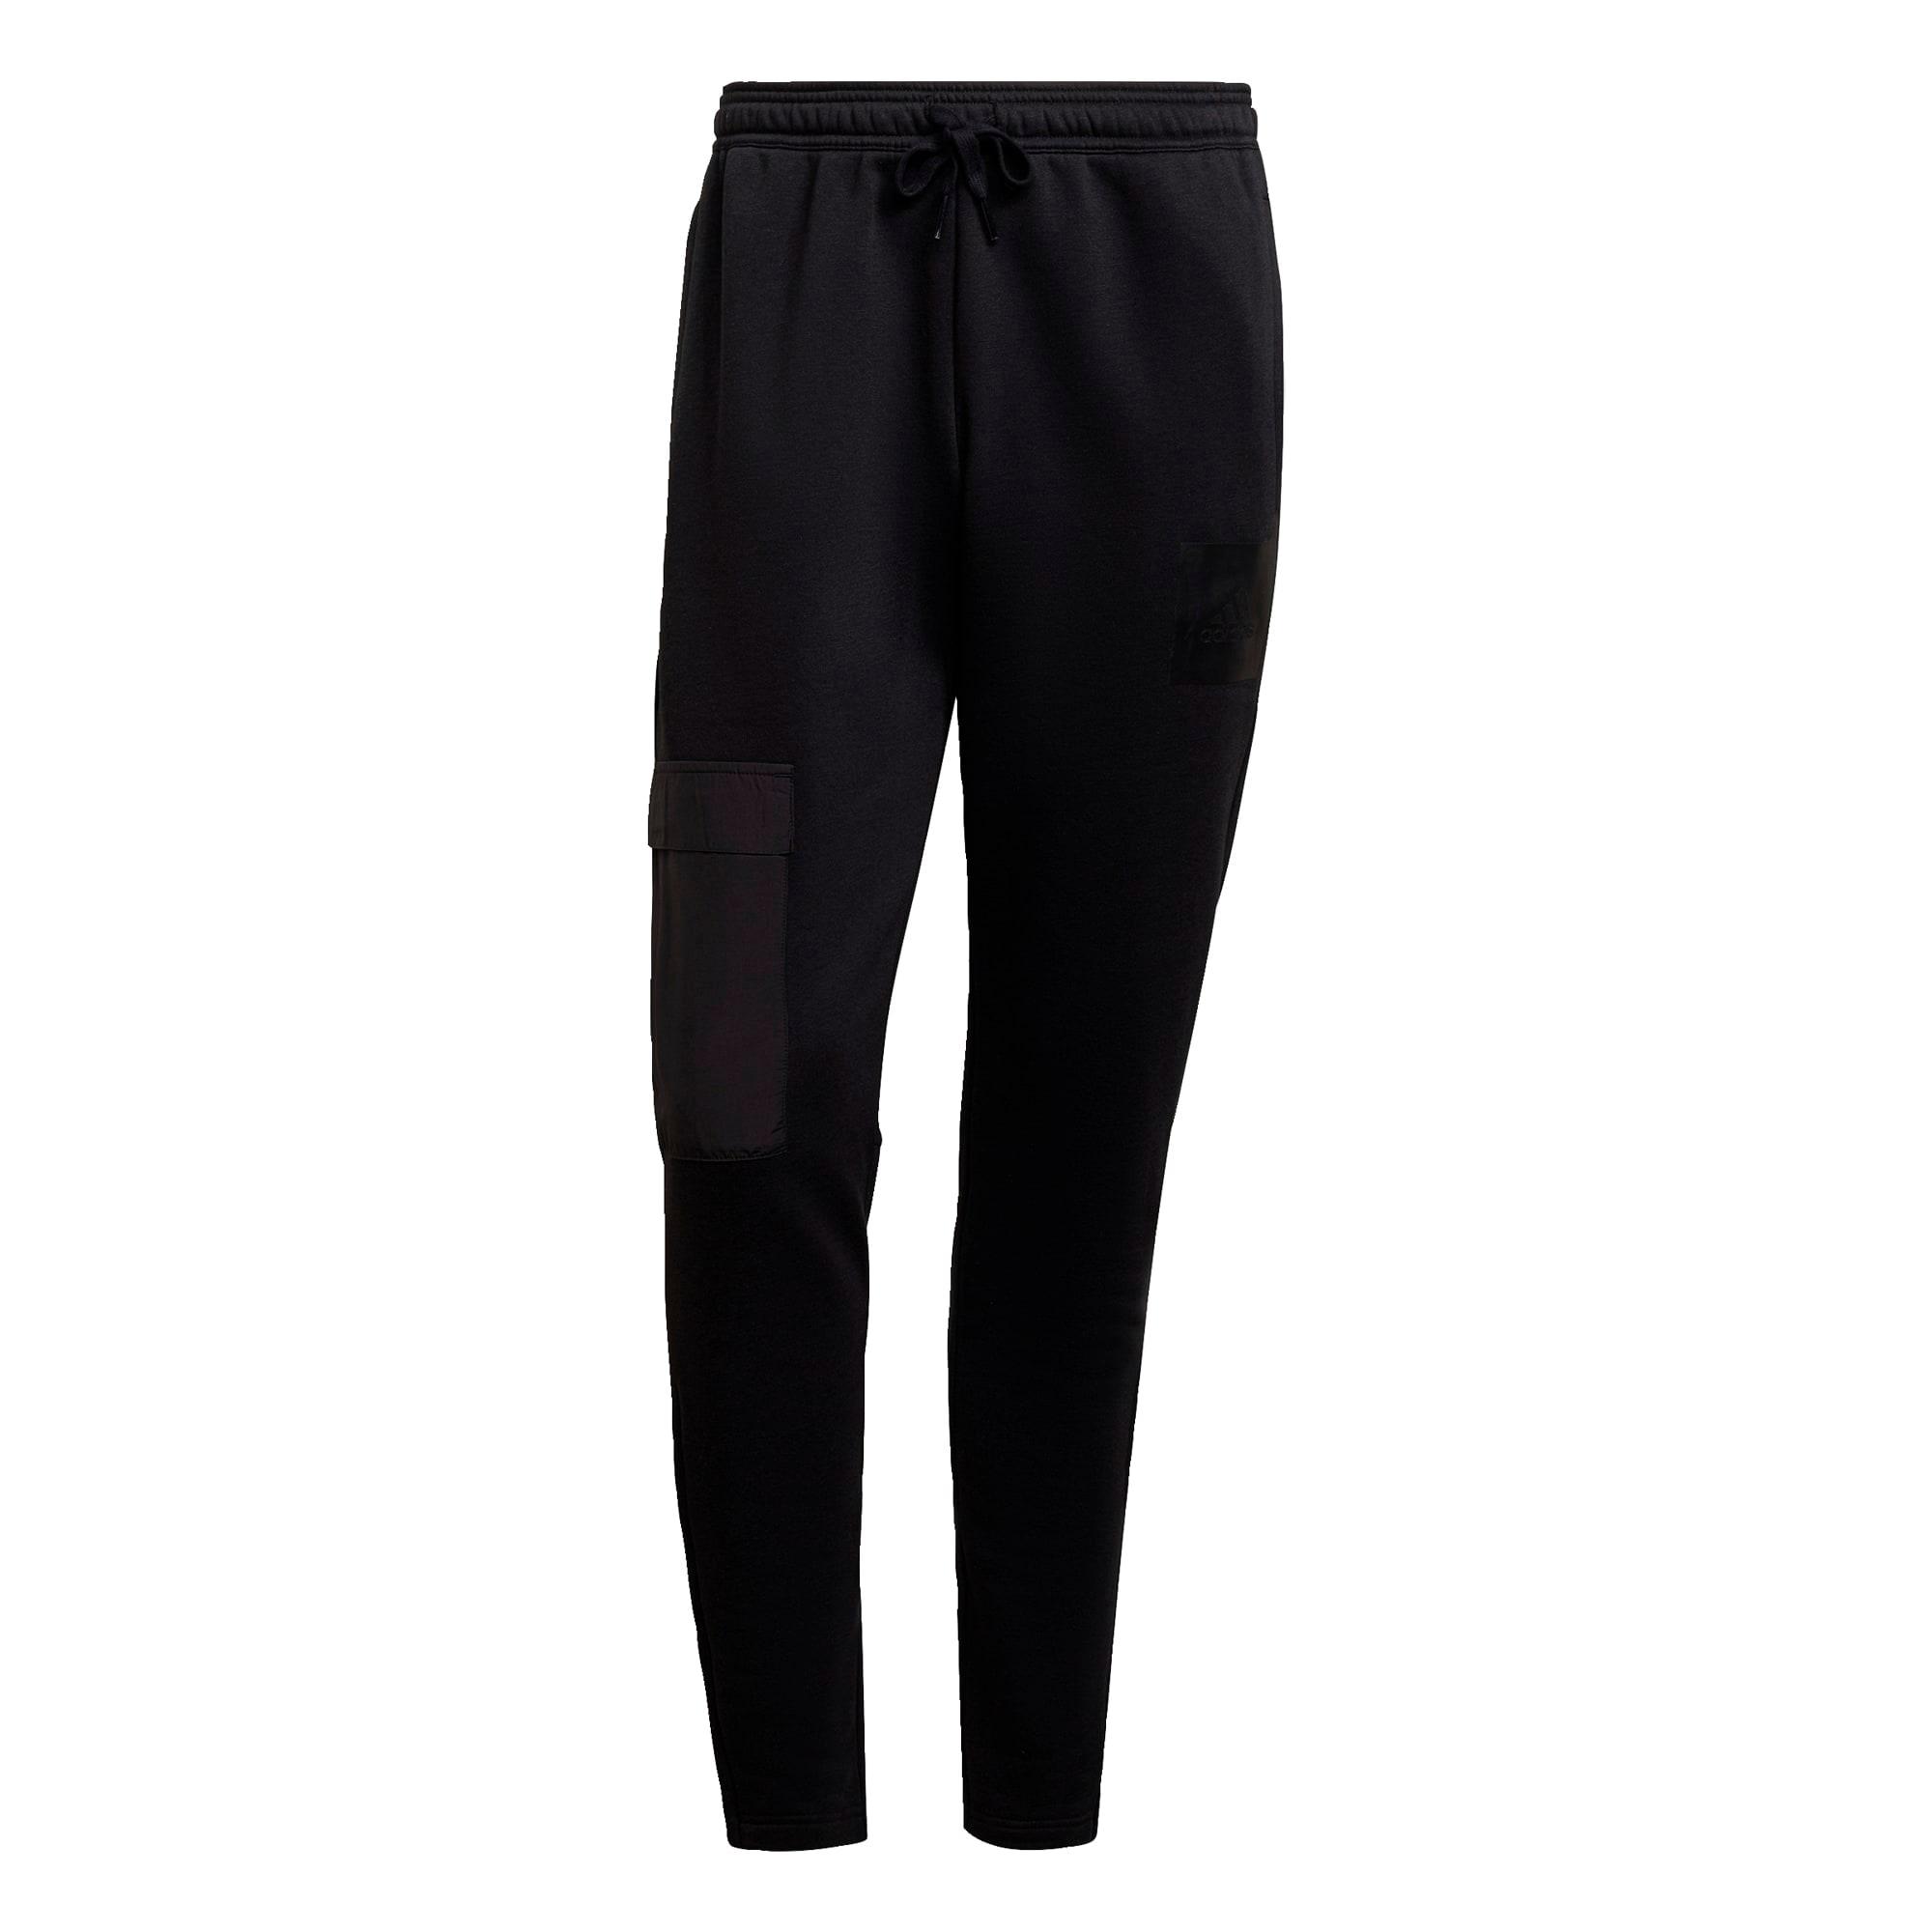 ADIDAS PERFORMANCE Sportovní kalhoty 'Essentials'  černá